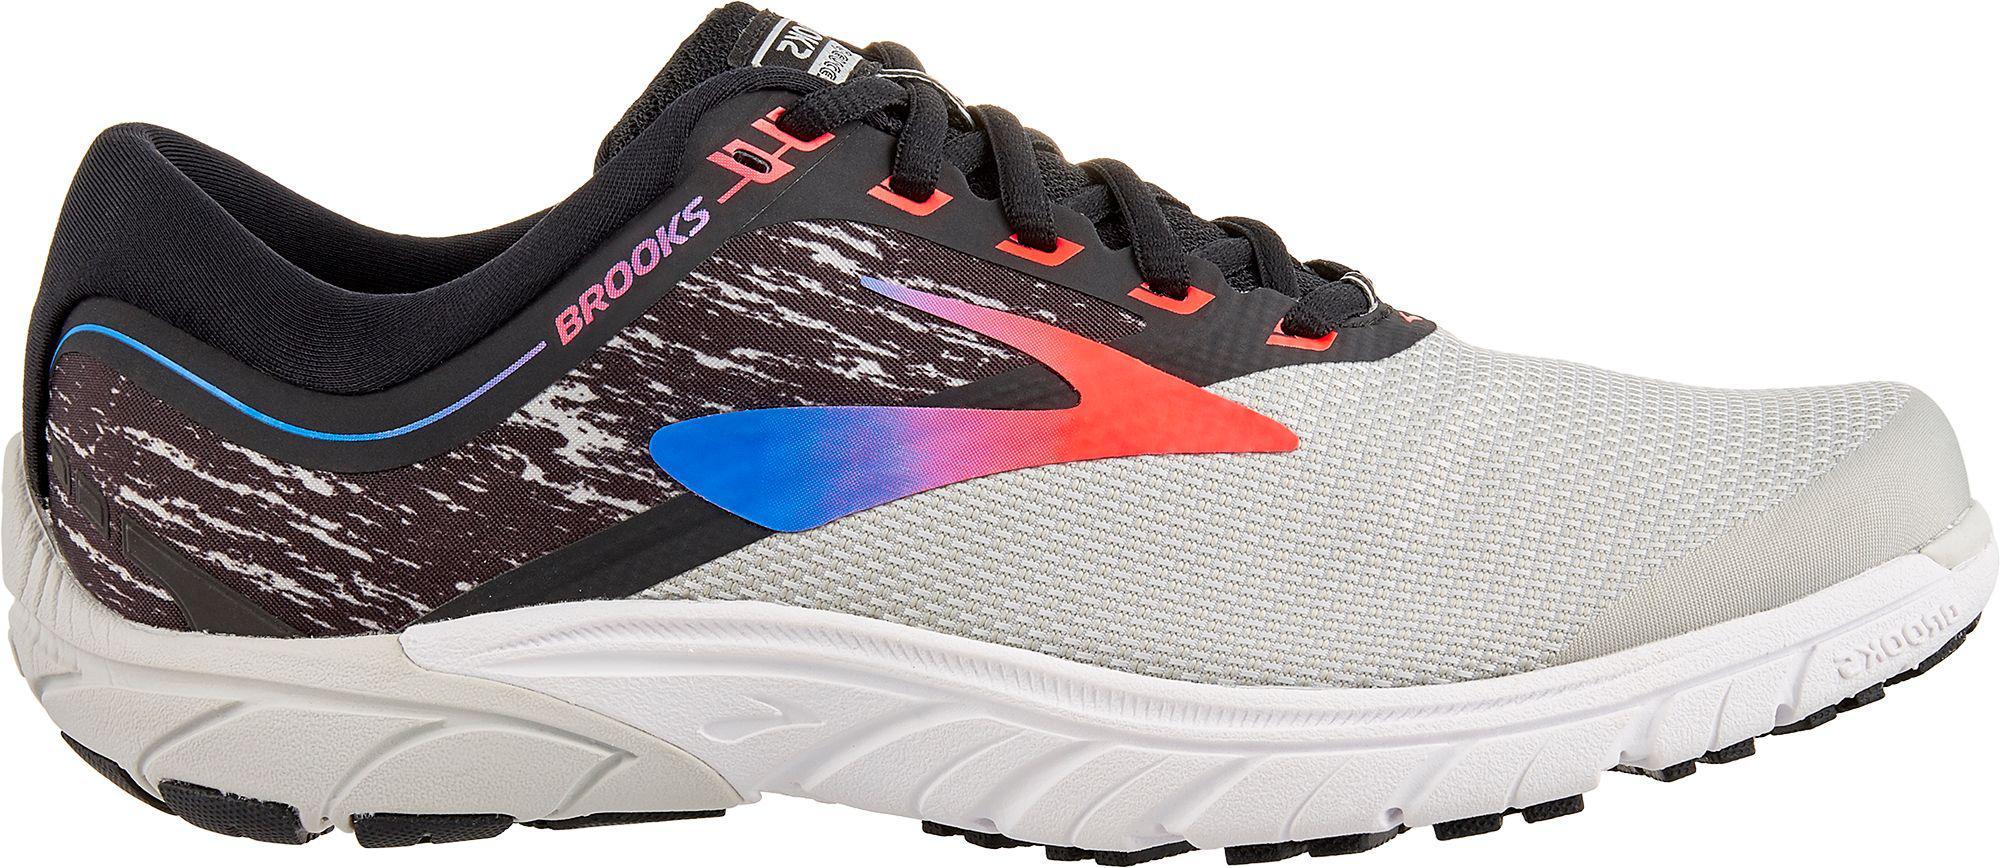 info for 4d049 ddee9 Brooks Gray Purecadence 7 Running Shoes